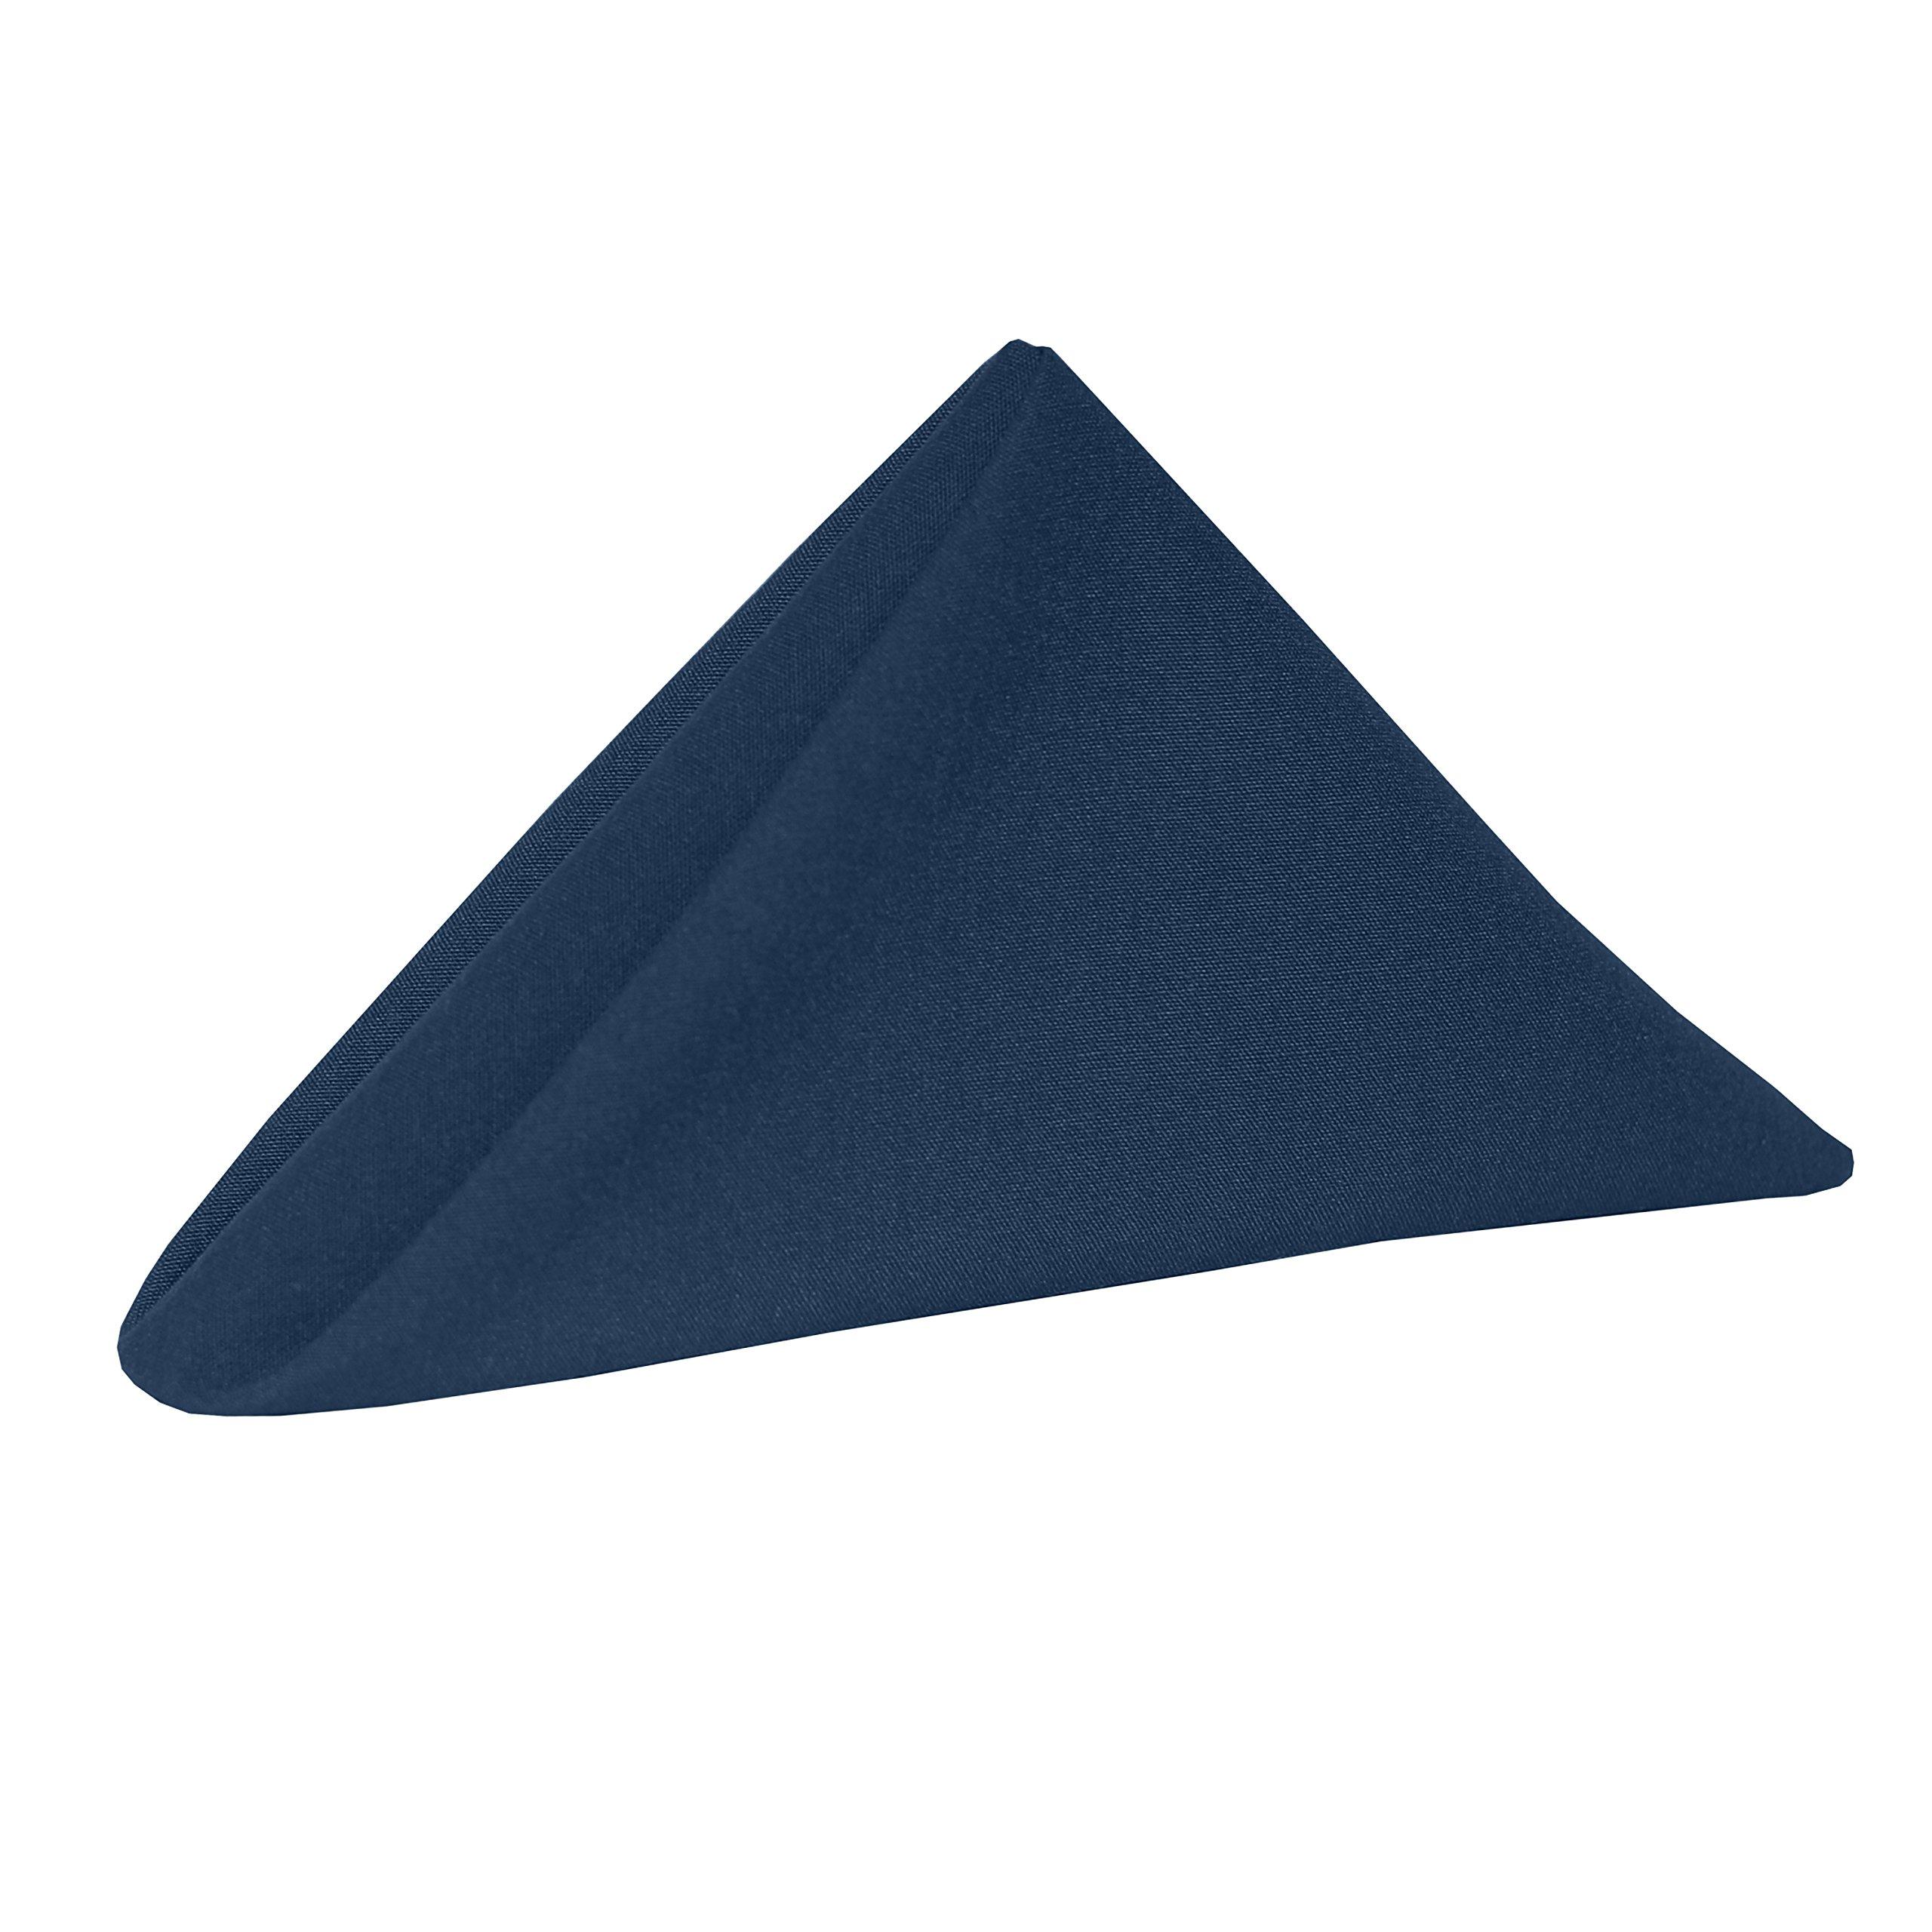 Ultimate Textile -5 Dozen- Cotton-Feel 20 x 20-Inch Cloth Dinner Napkins, Navy Blue